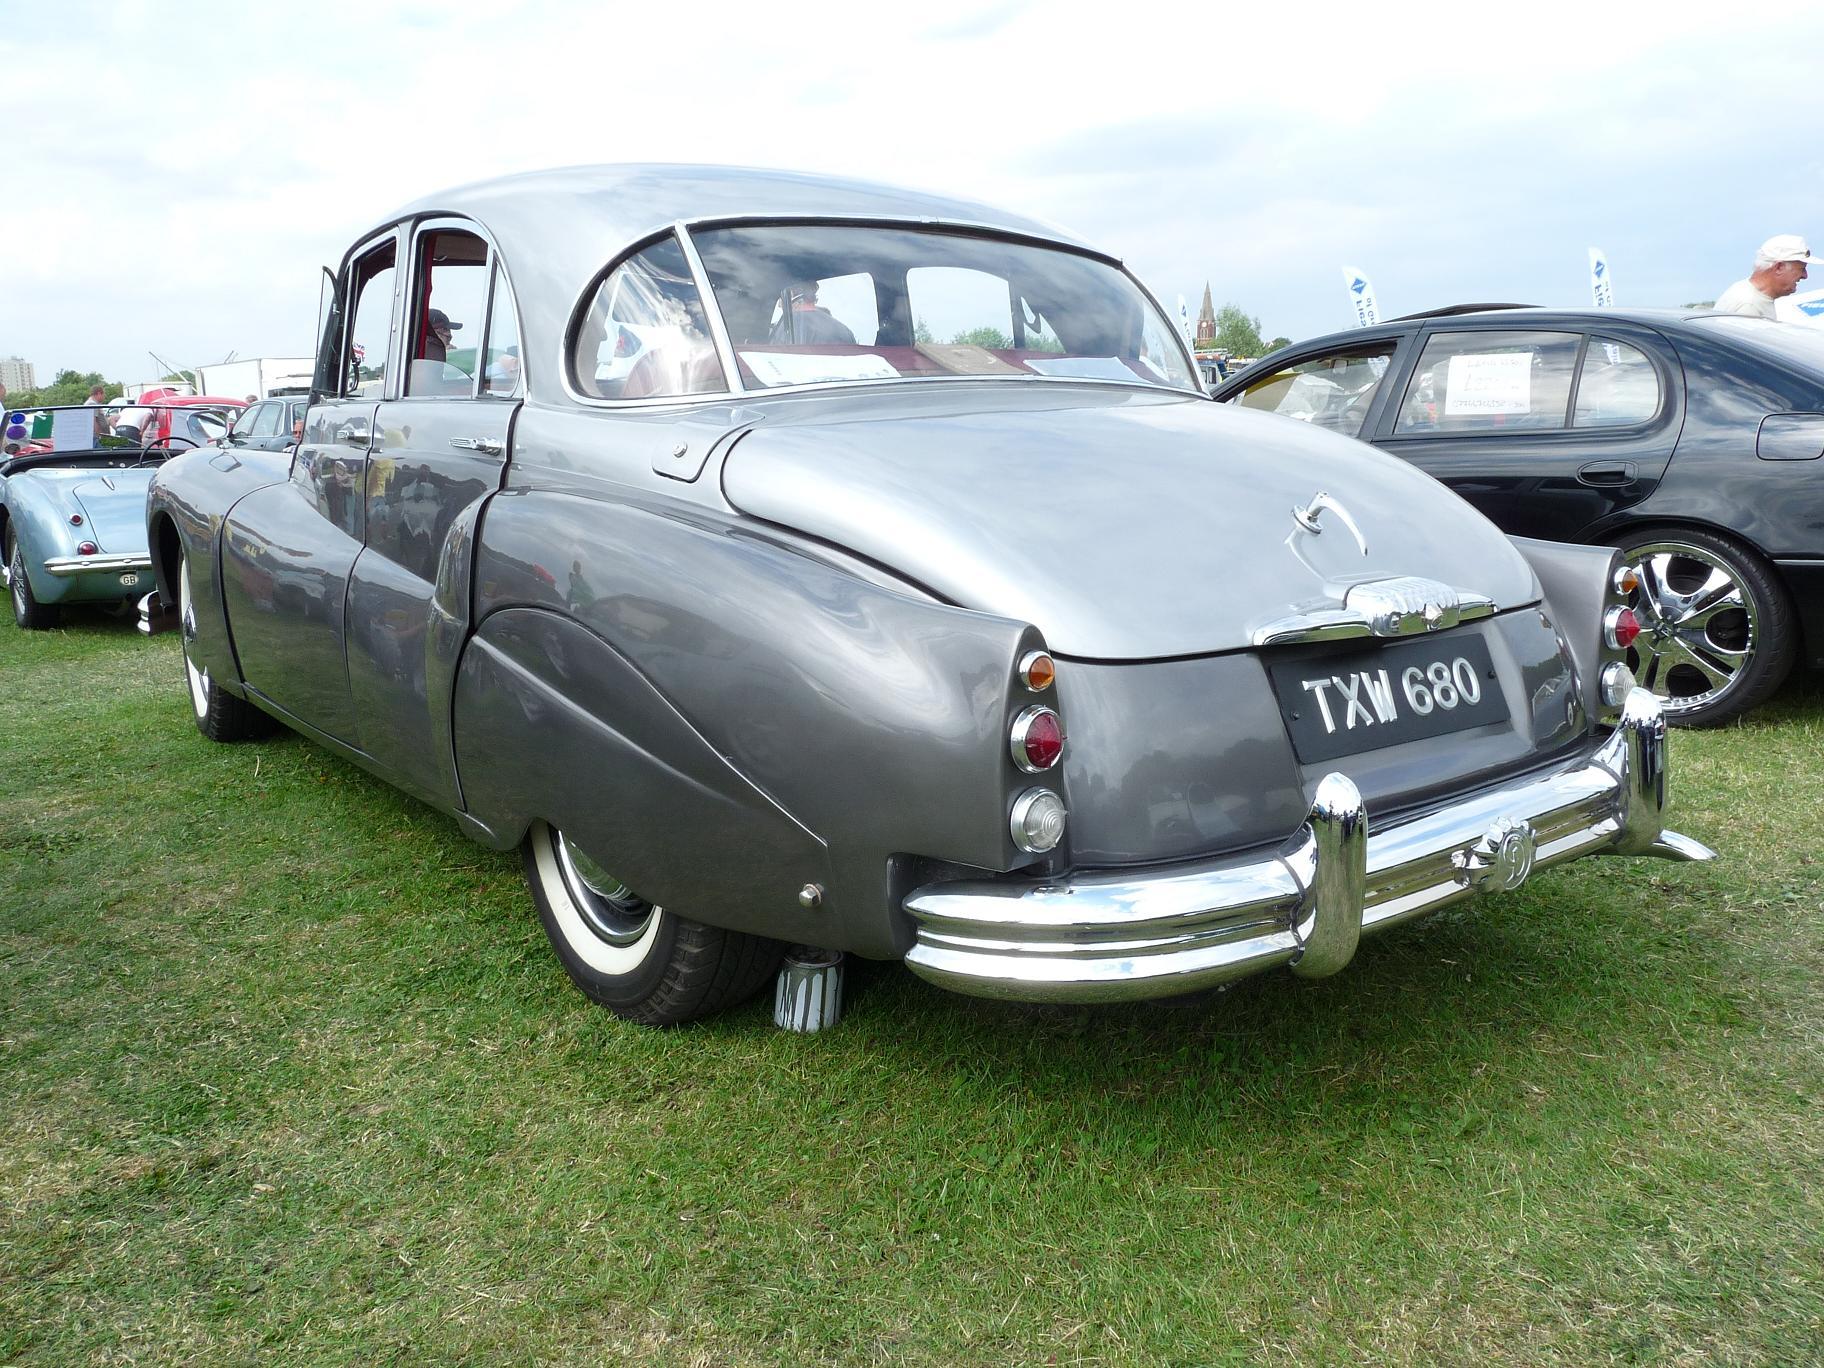 https://upload.wikimedia.org/wikipedia/commons/b/bb/Daimler_1957.jpg